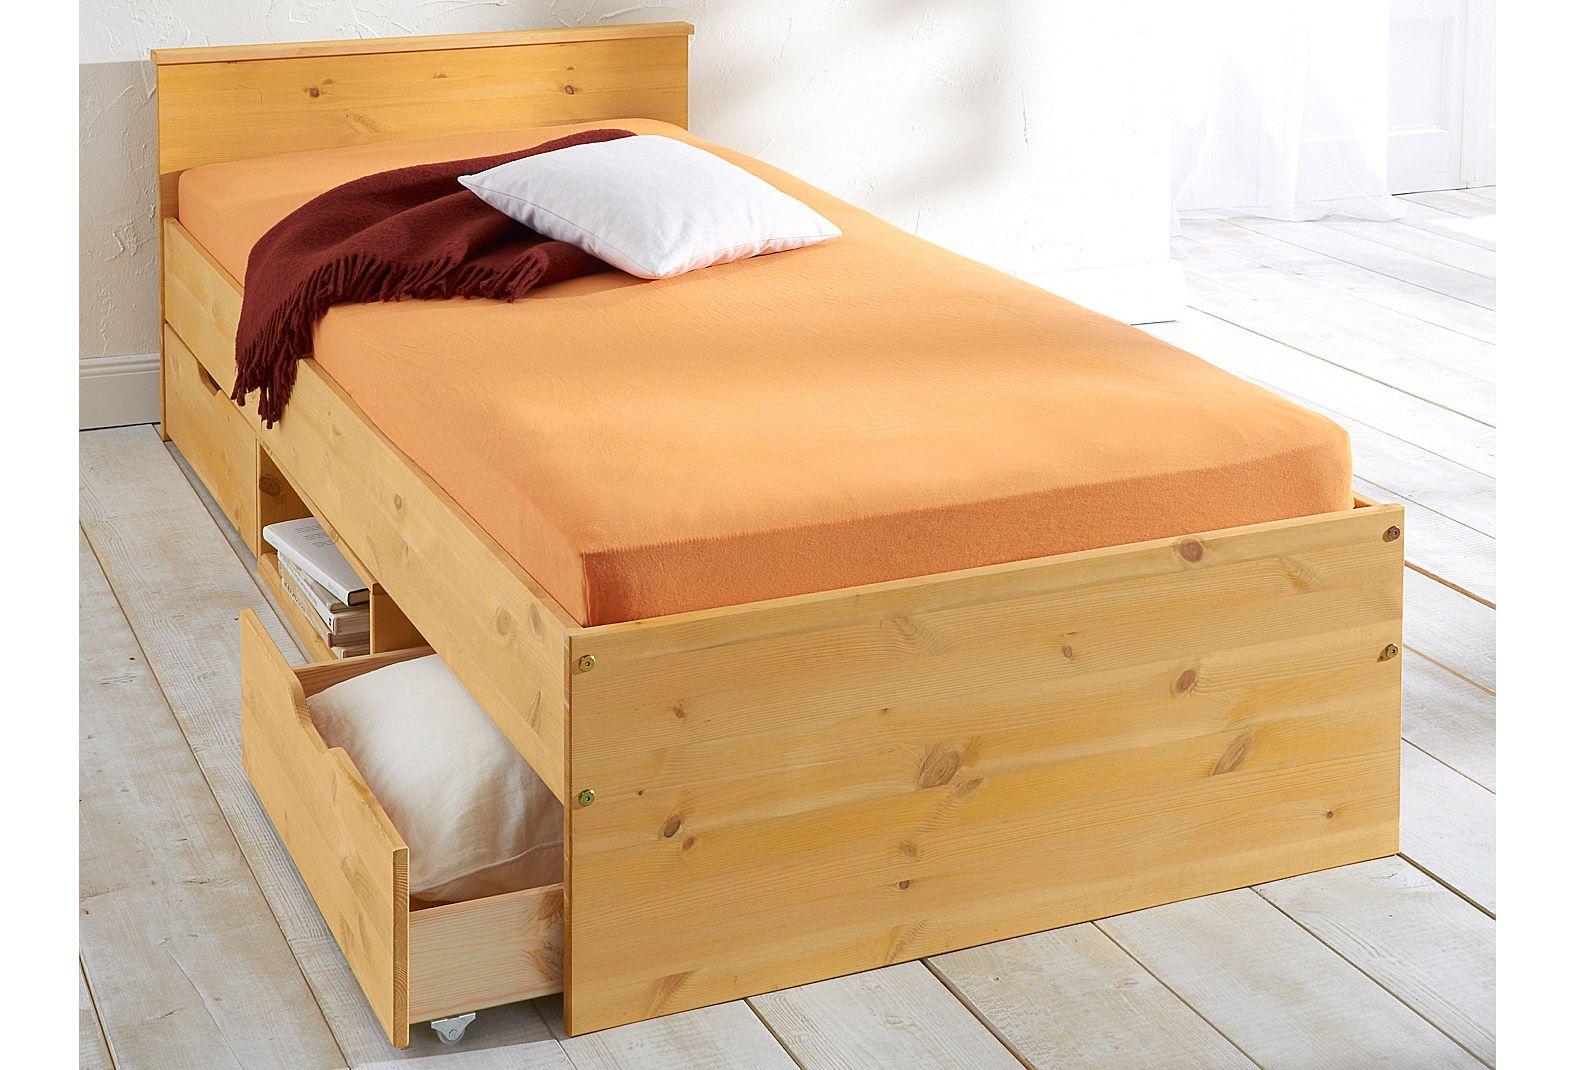 bett home affaire schwab versand betten. Black Bedroom Furniture Sets. Home Design Ideas